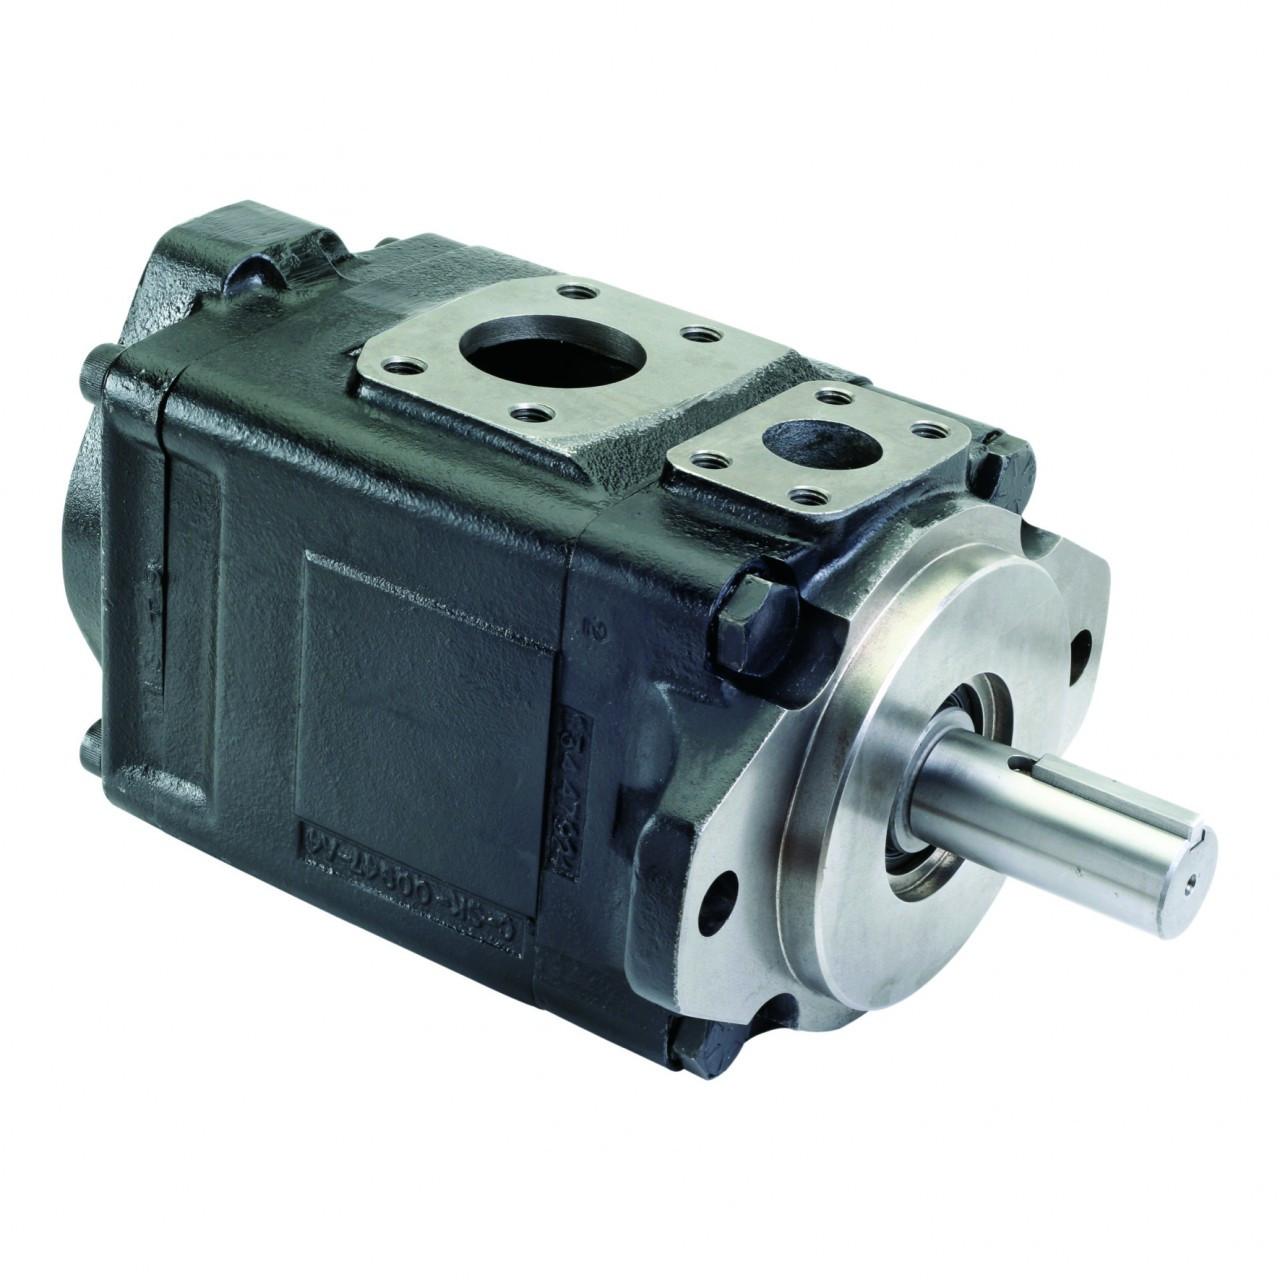 Veljan Single Vane Pump - VT6DR - Rons Drivelines | Drivelines | Driveshafts | Differentials